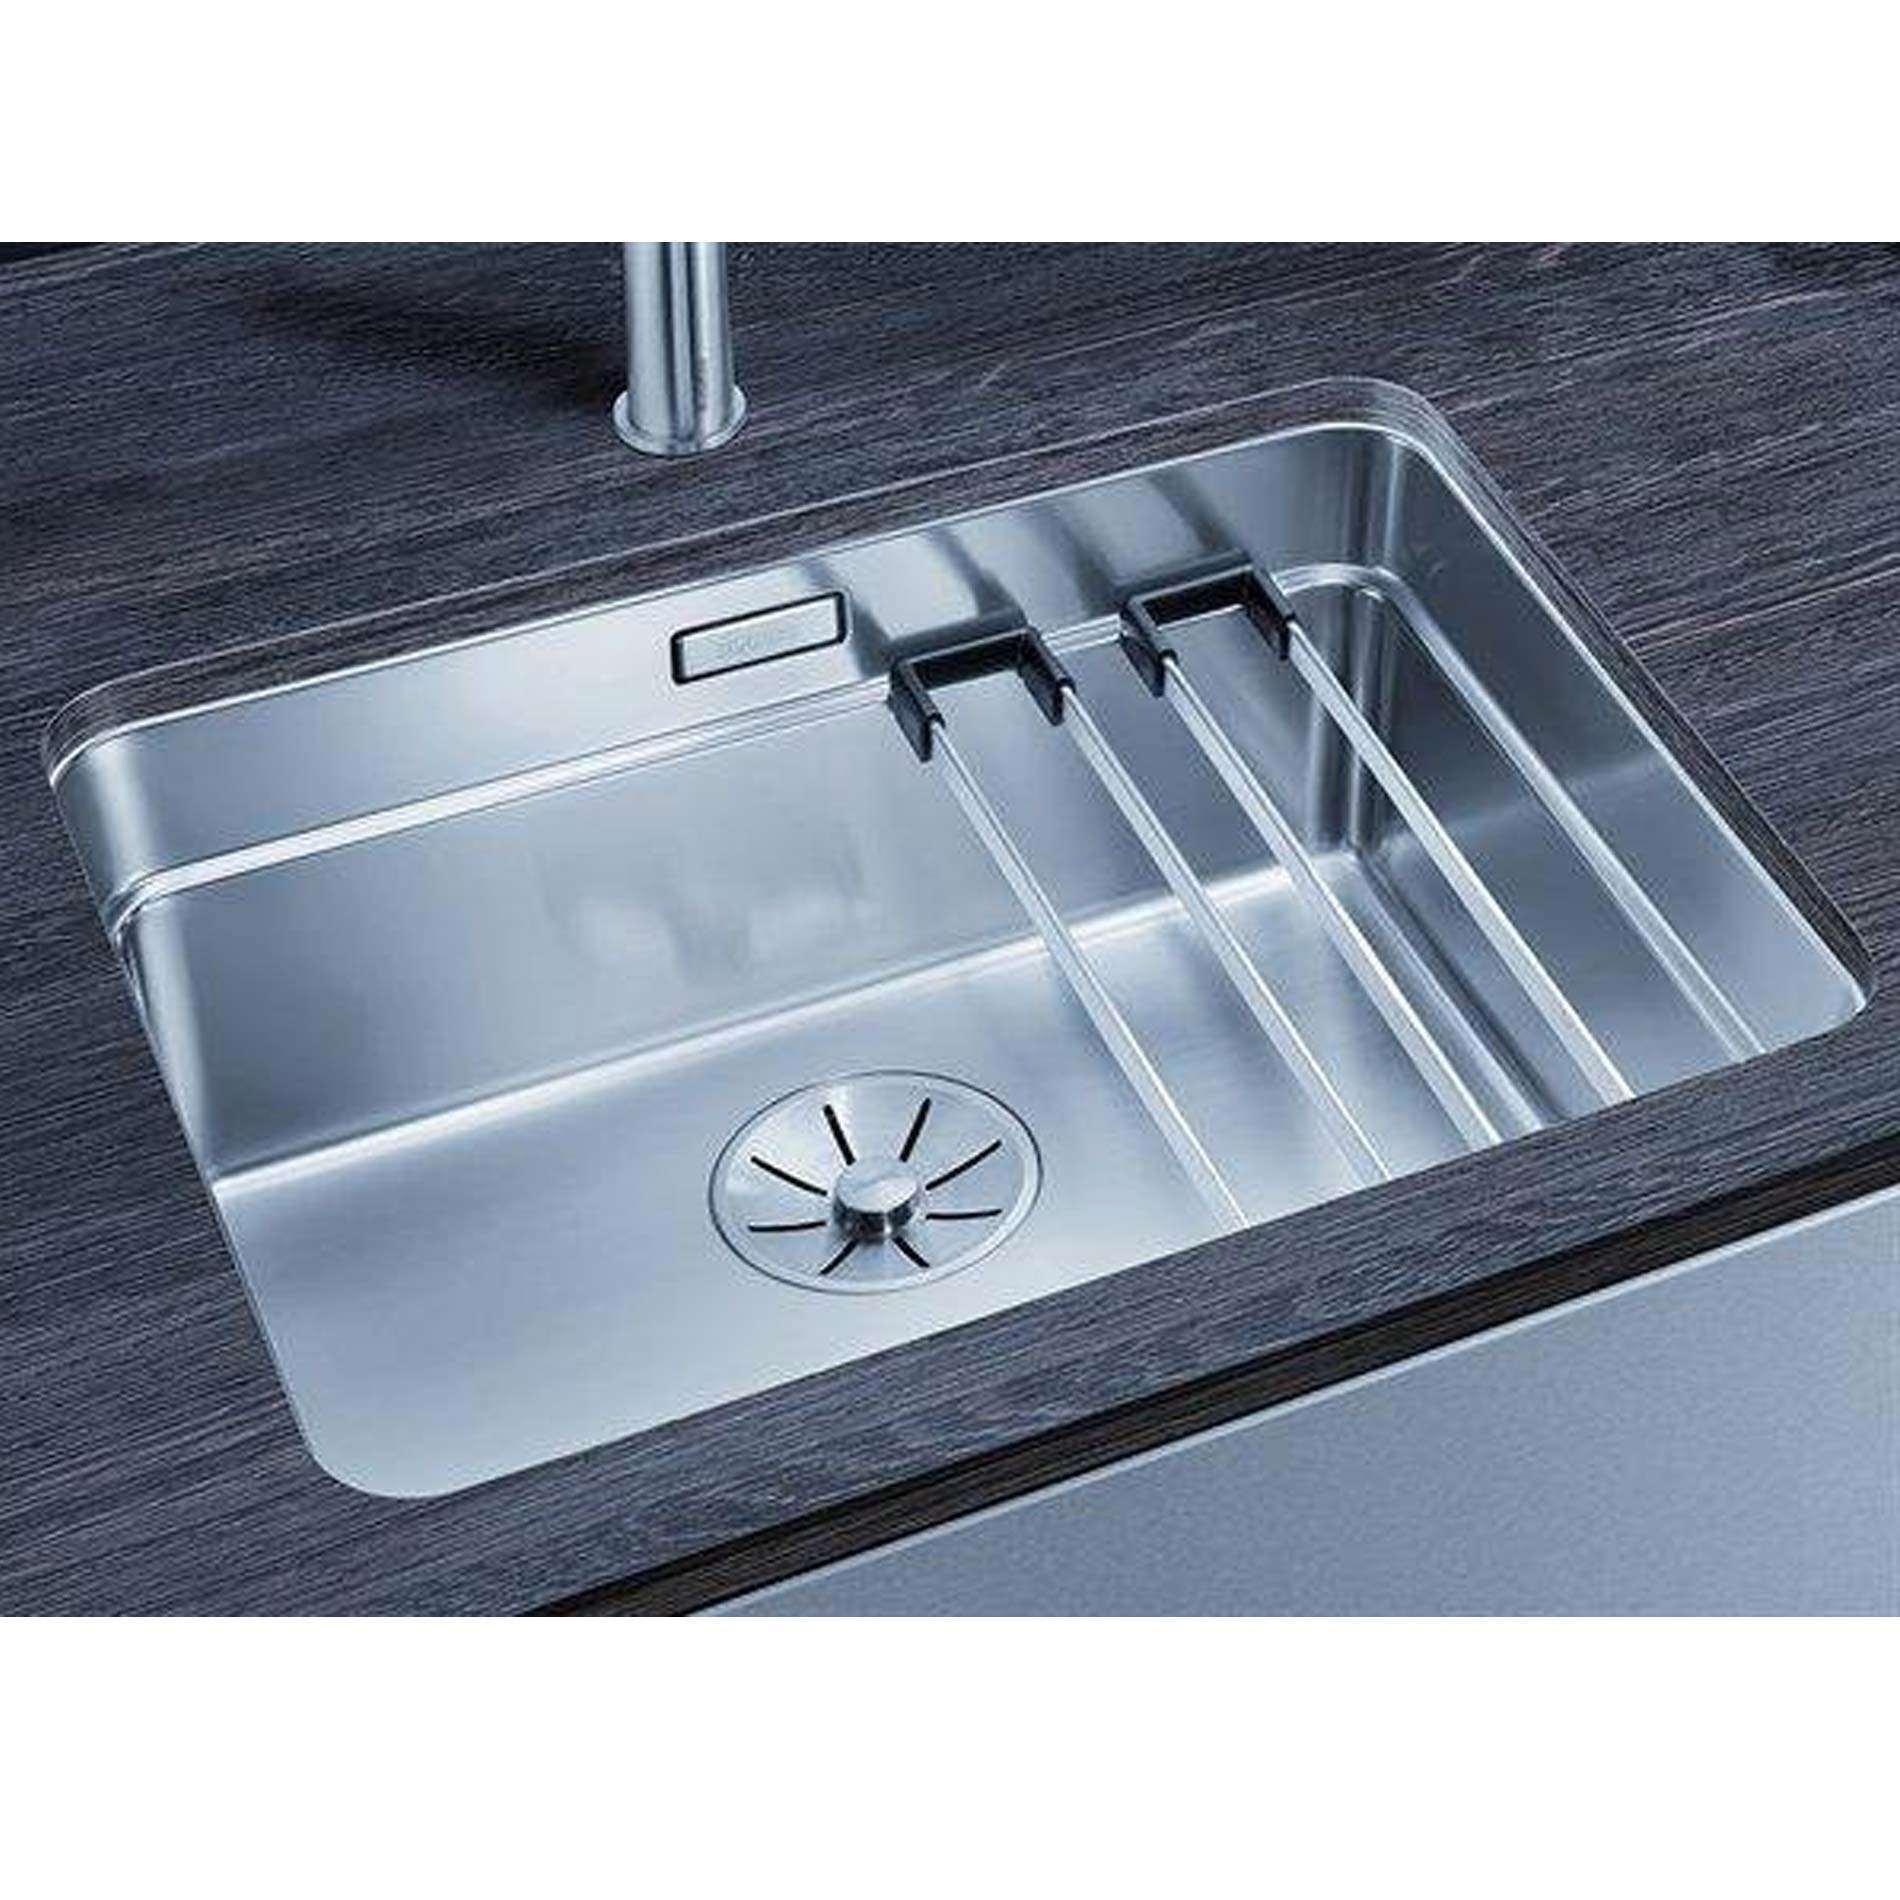 Blanco Etagon 500 U Stainless Steel Sink Kitchen Sinks